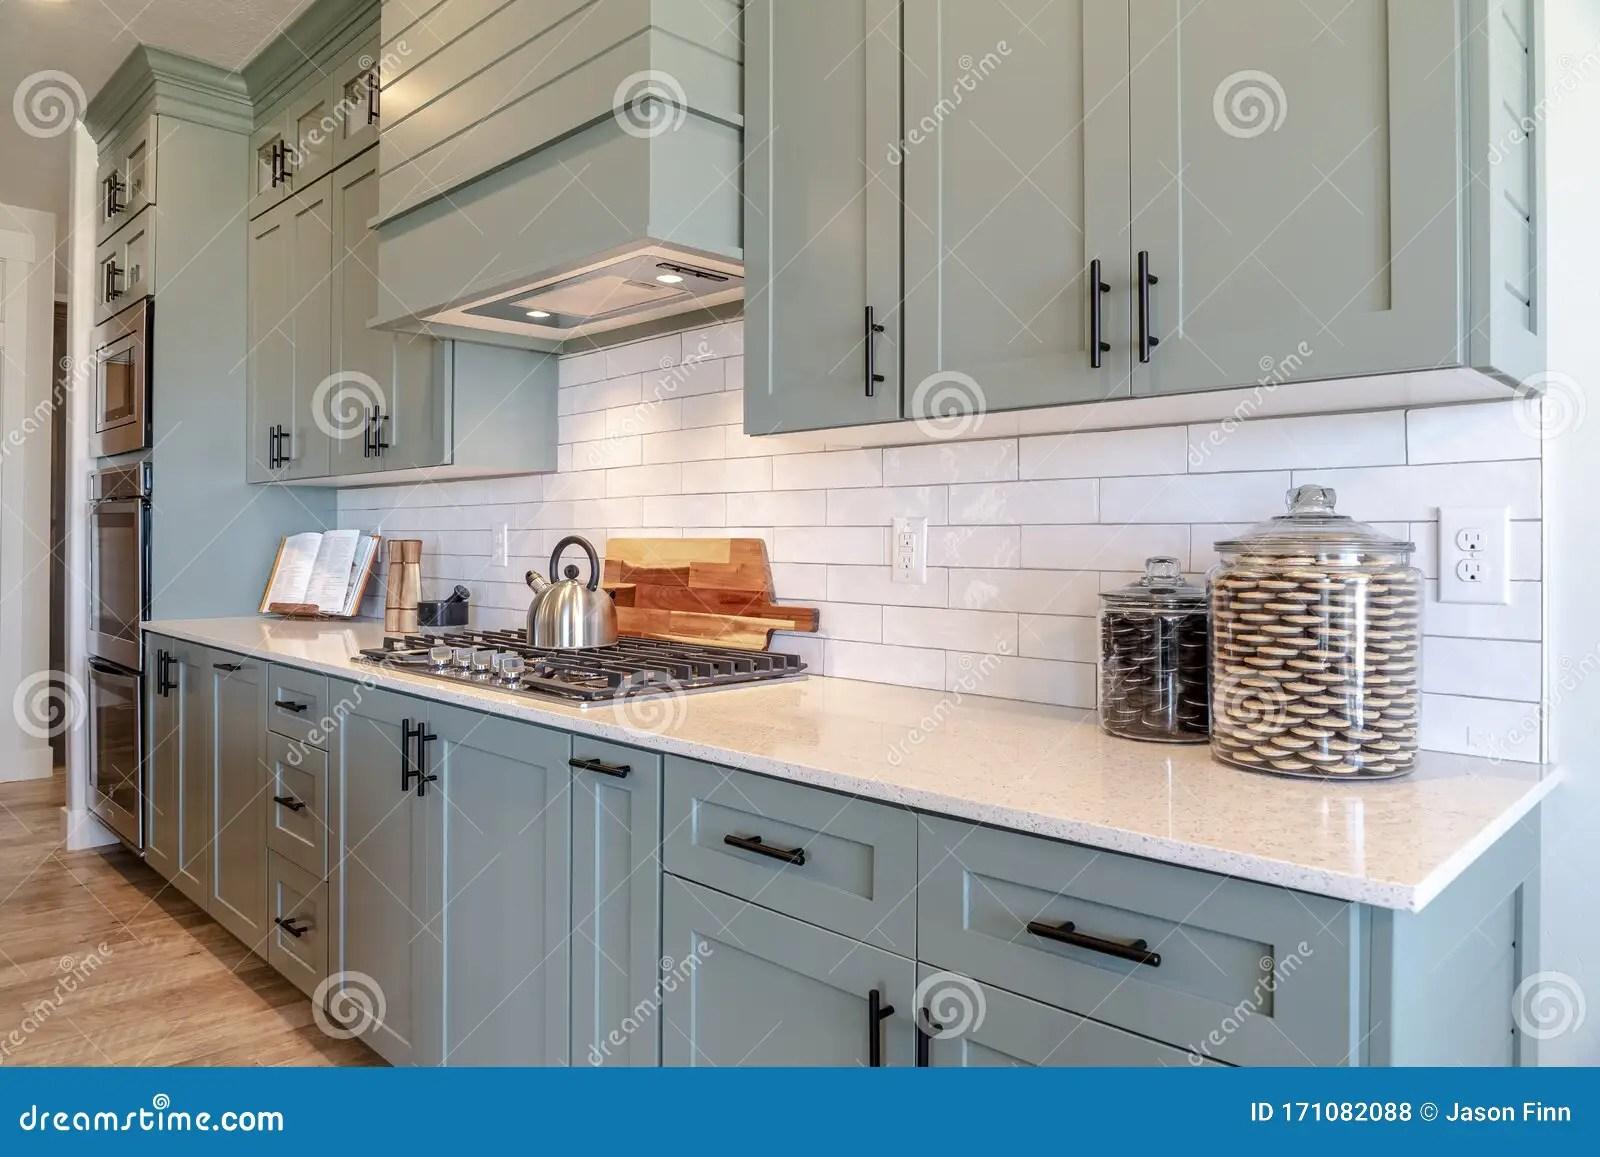 https www dreamstime com kitchen interior cooktop white counter top under hanging cabinets appliances wooden floor tile backsplash can also be image171082088